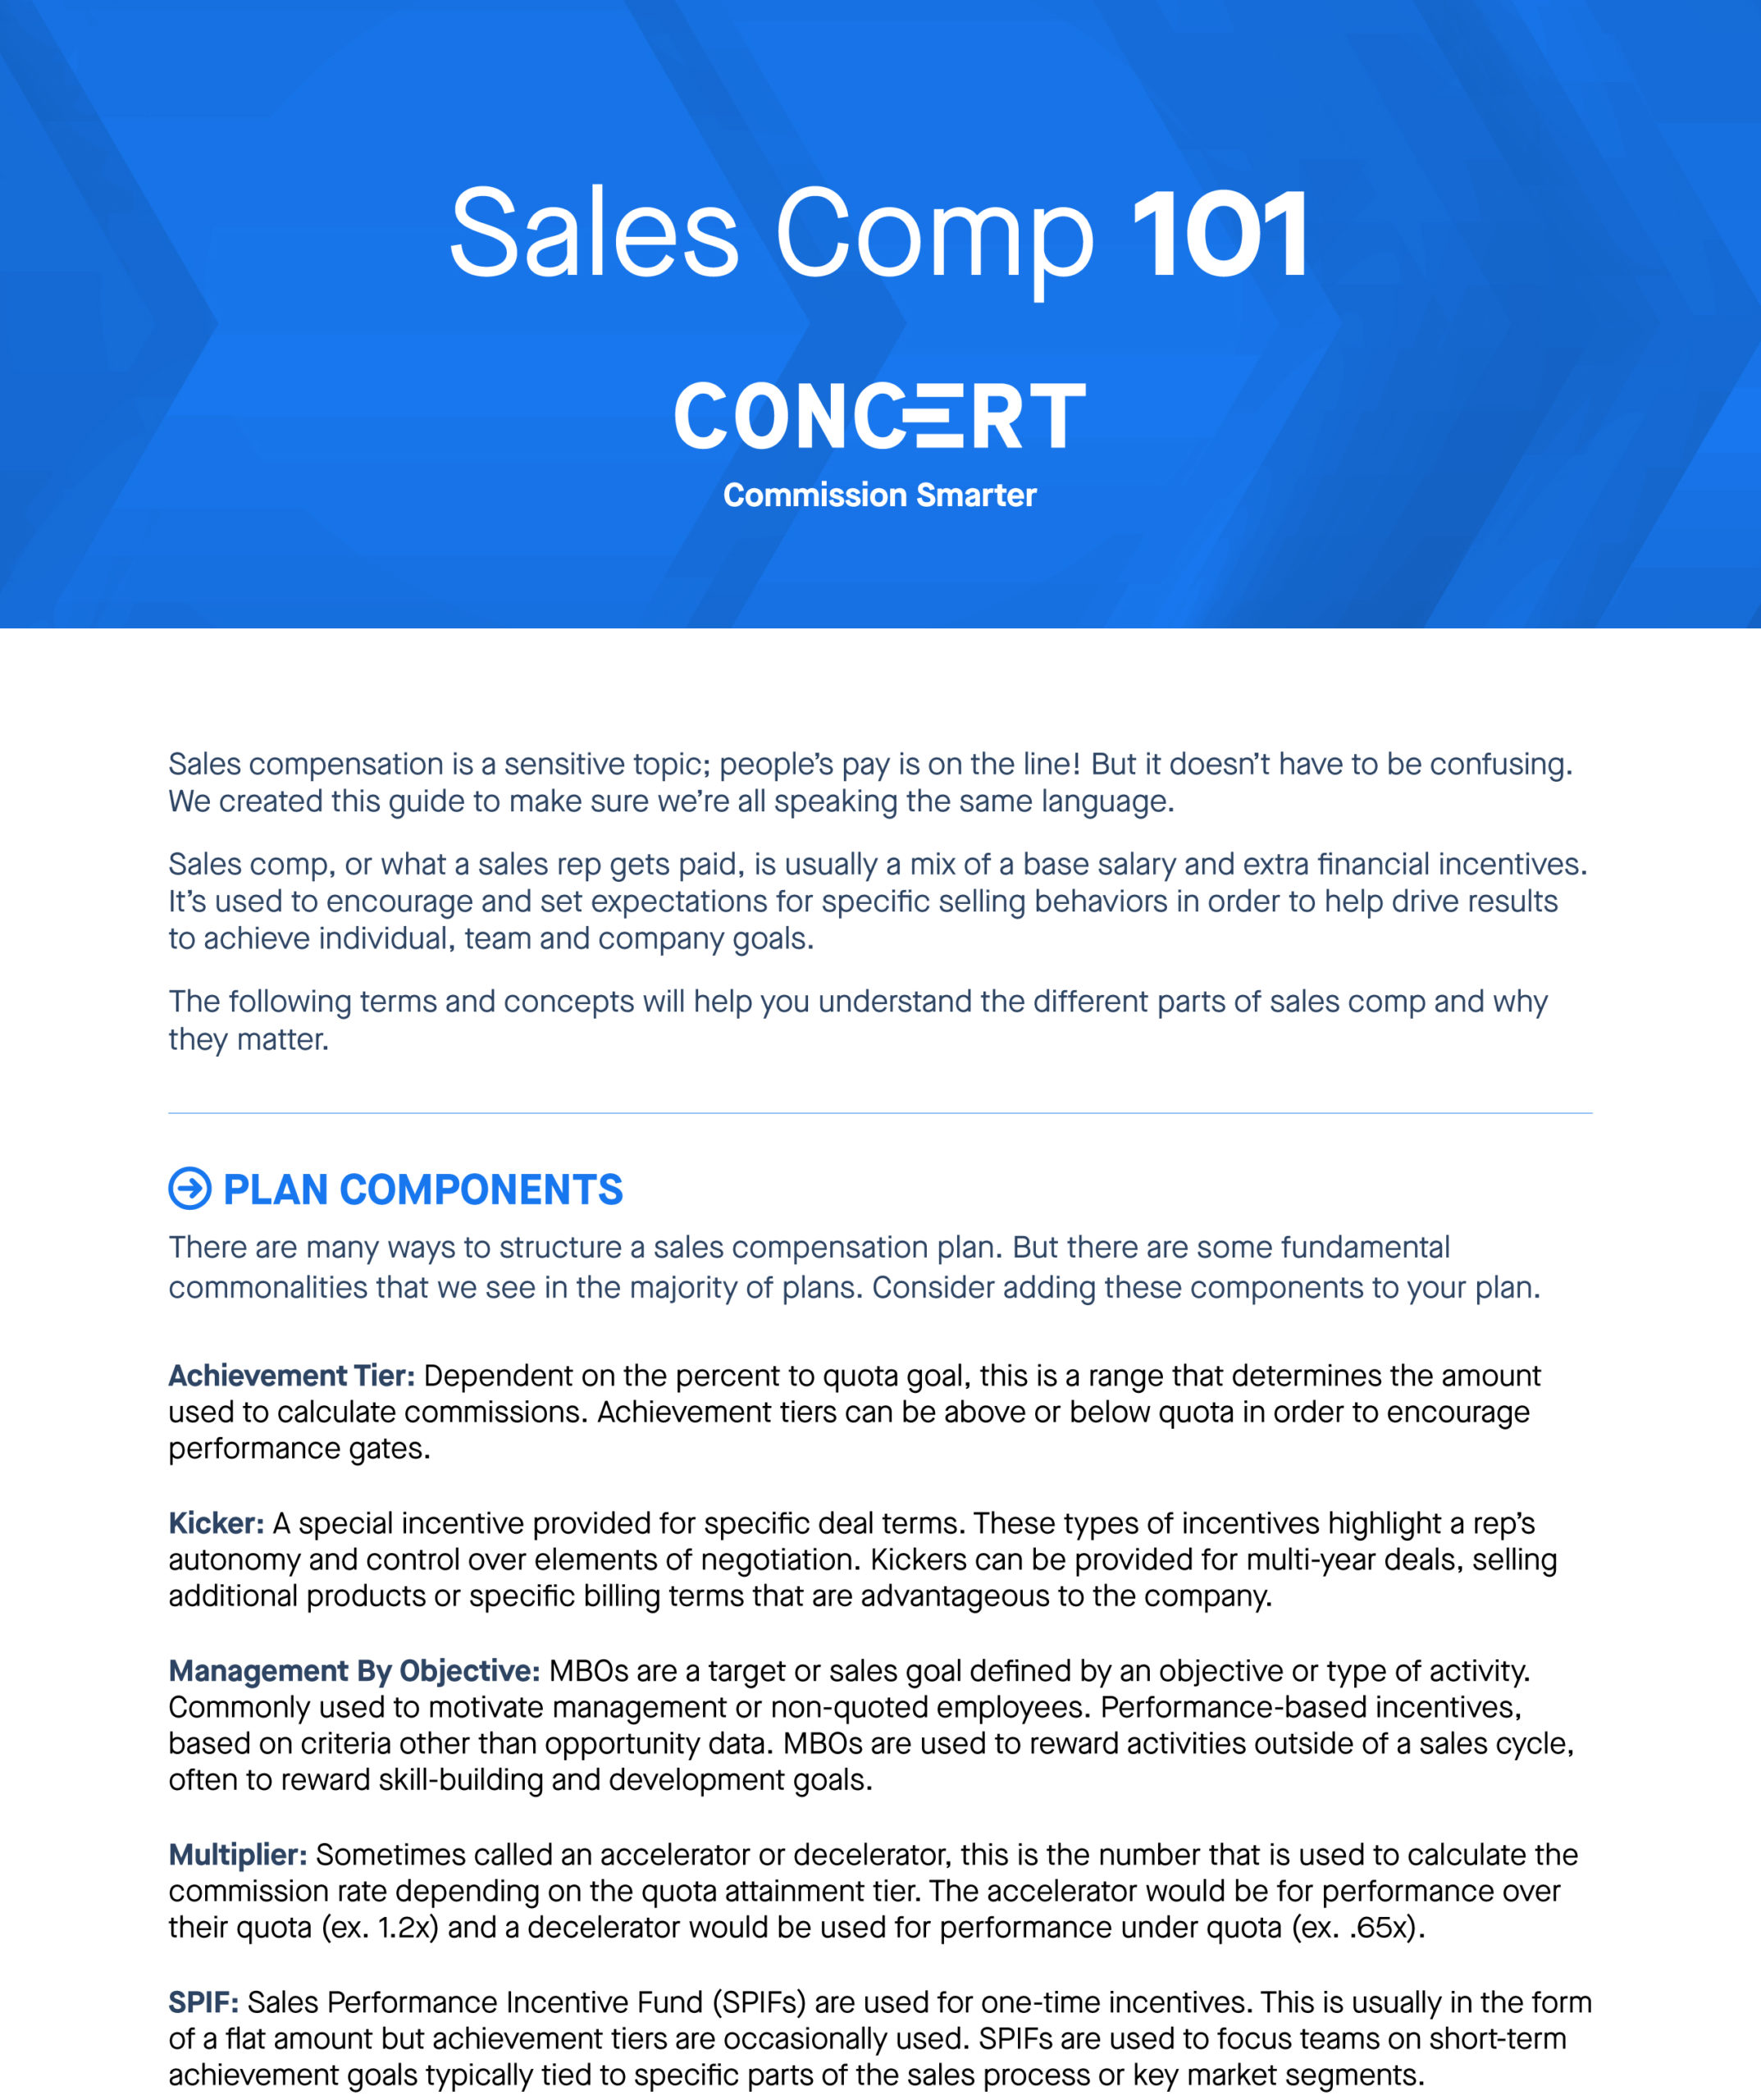 Sales Comp 101